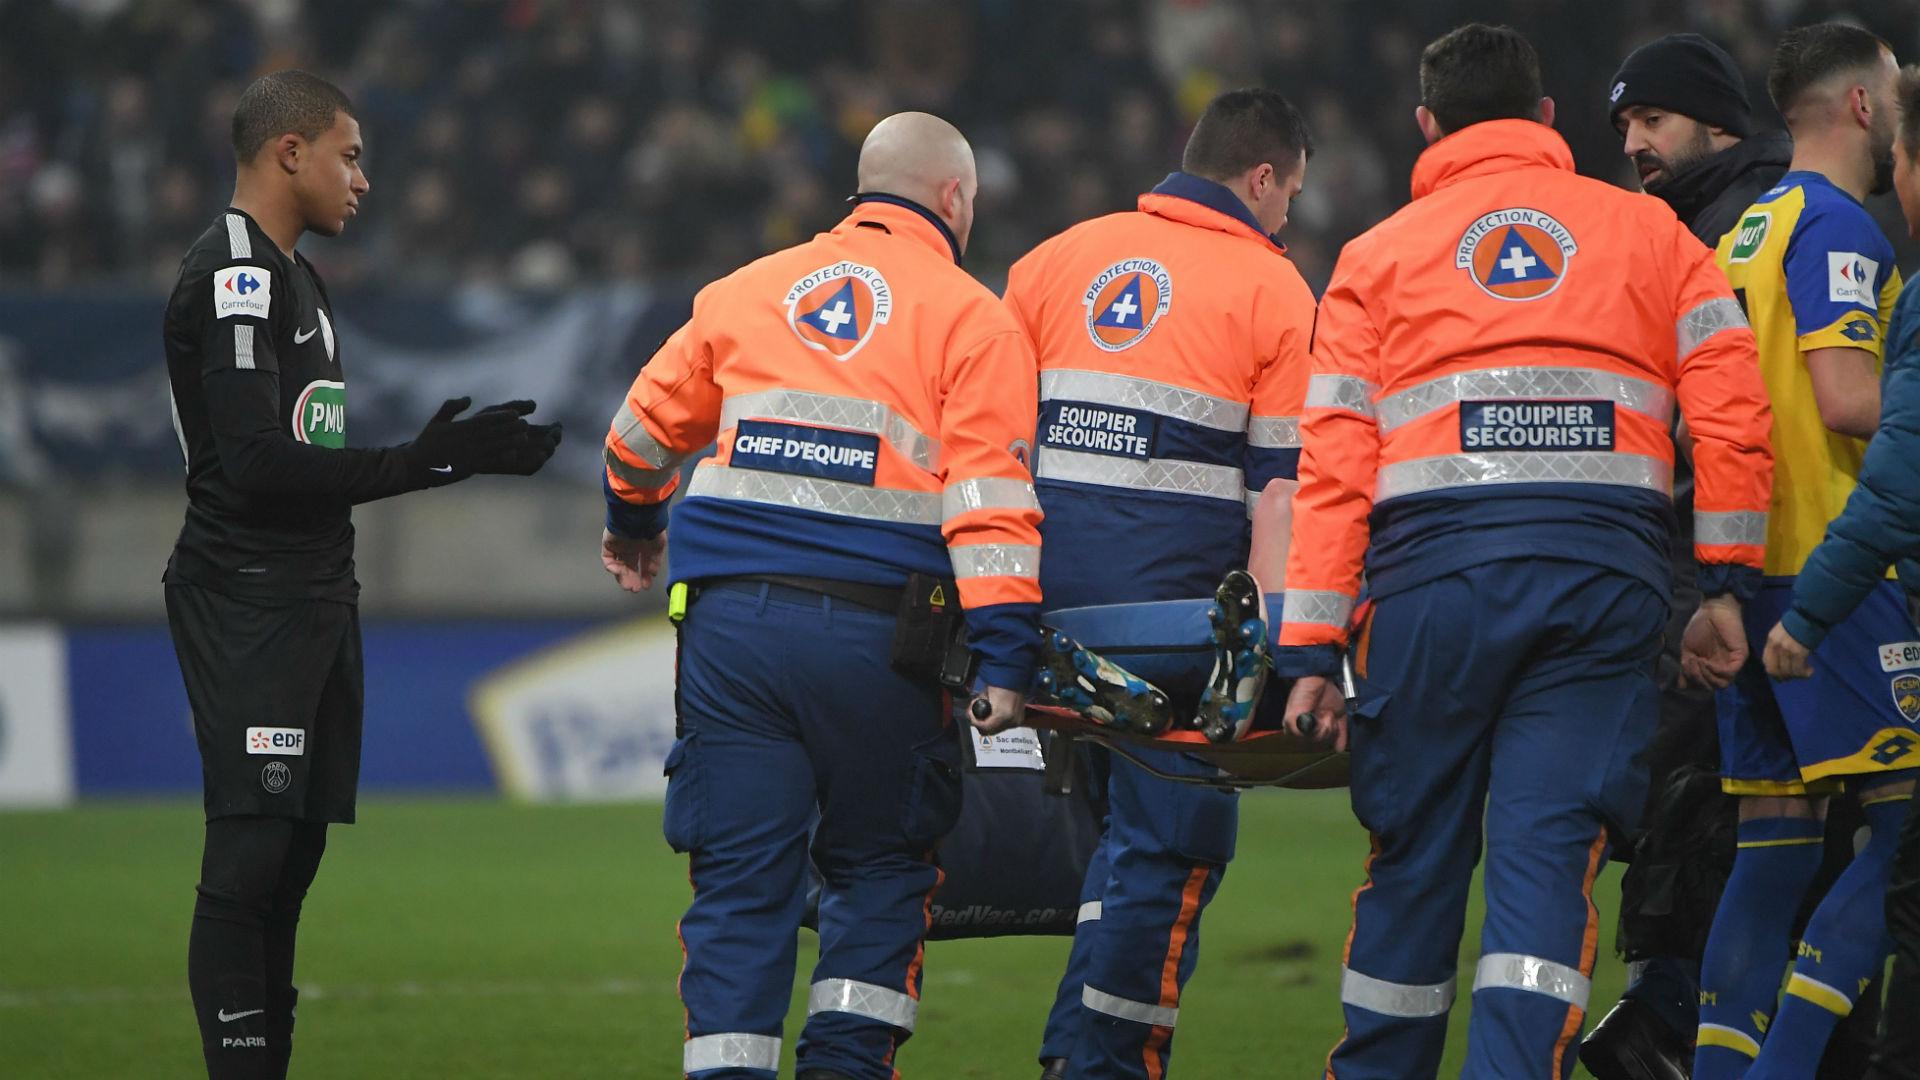 Blessure, fin de saison pour Martin selon Peter Zeidler — FC Sochaux